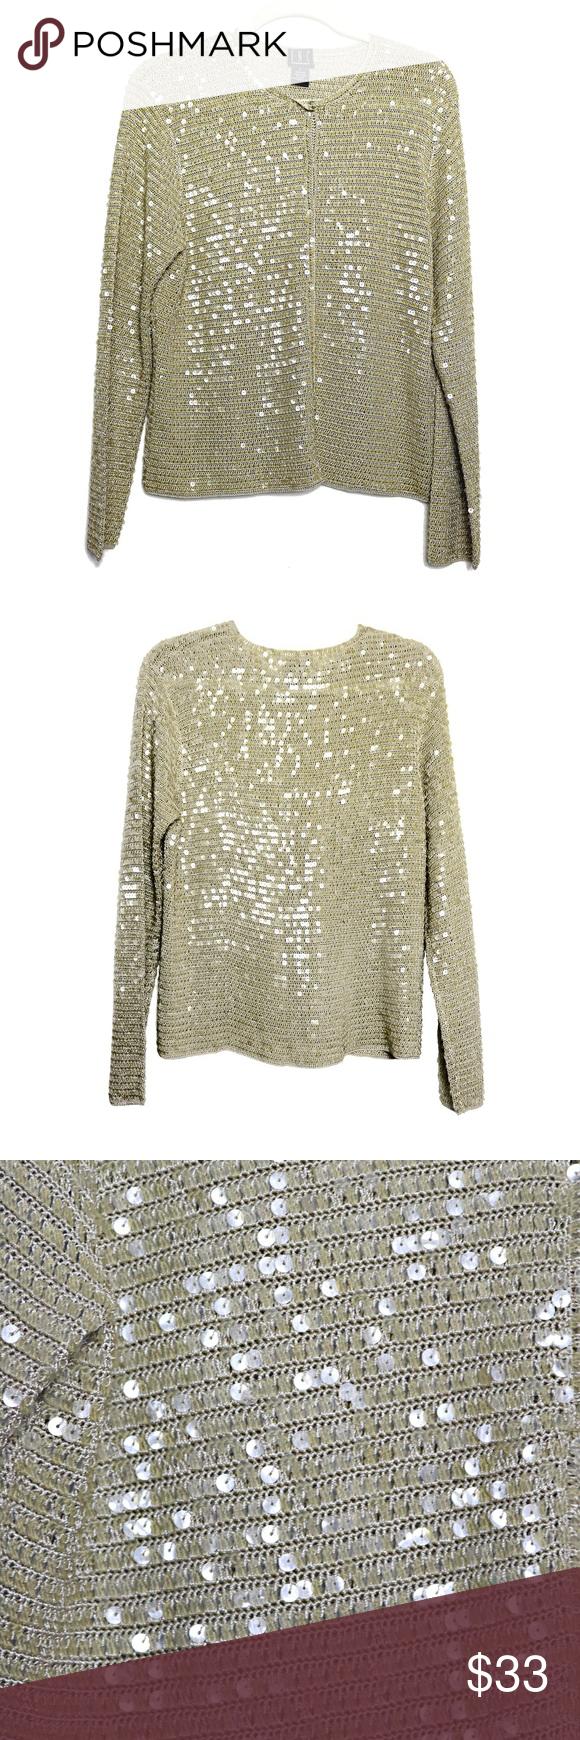 Metallic Sparkle Sequined Cardigan Light Gold